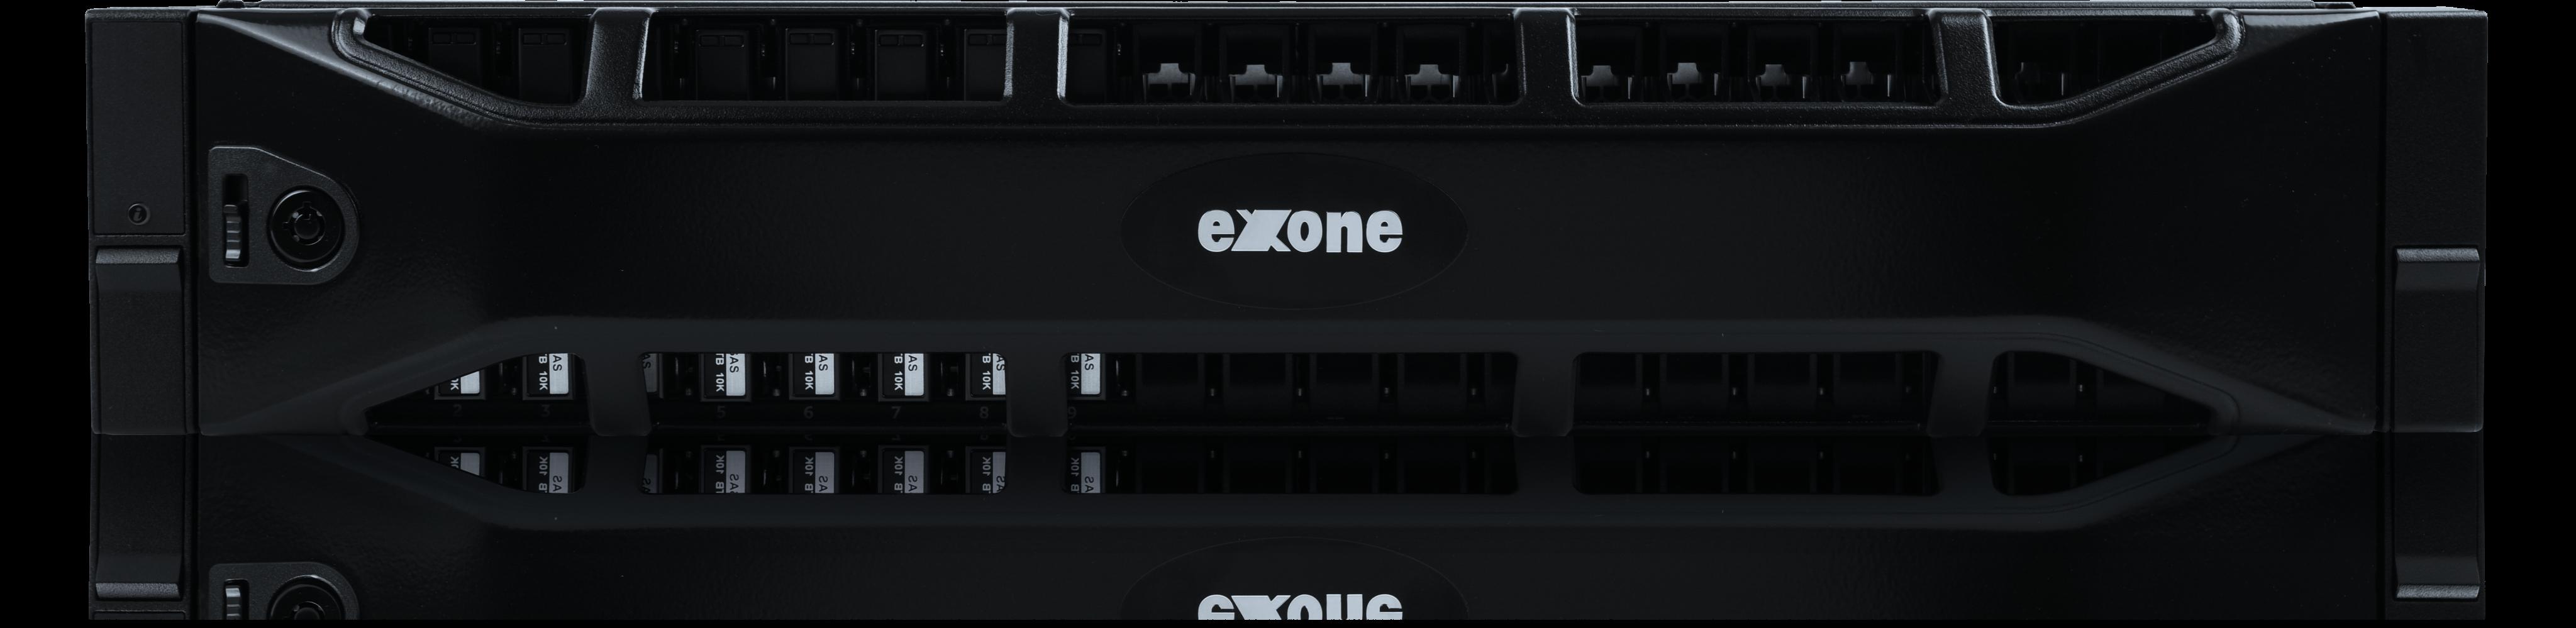 exone SAN-System